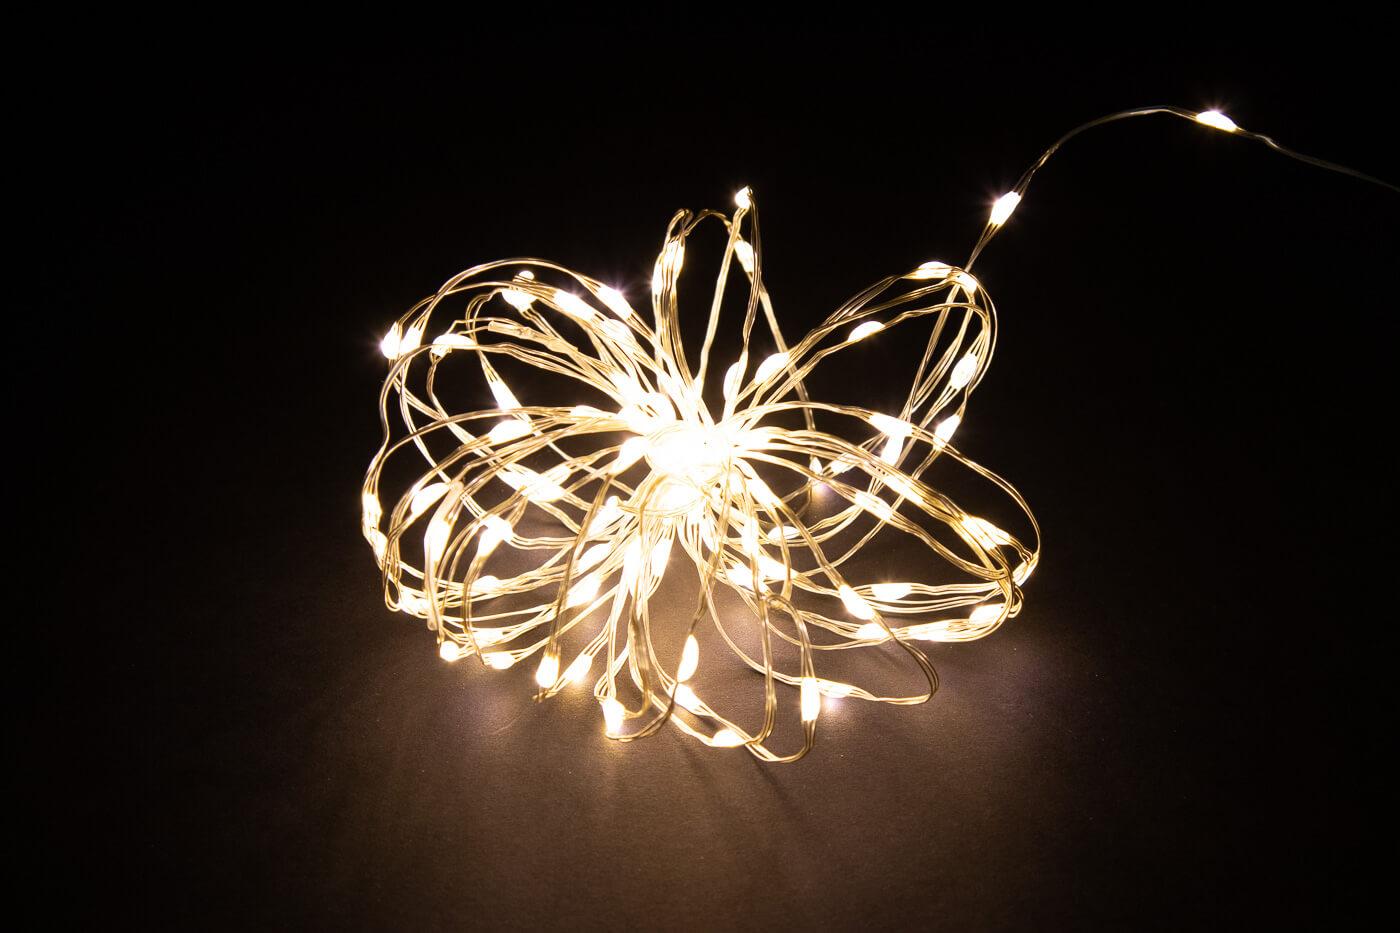 LED Microlichterkette 120 warmweiss IP44